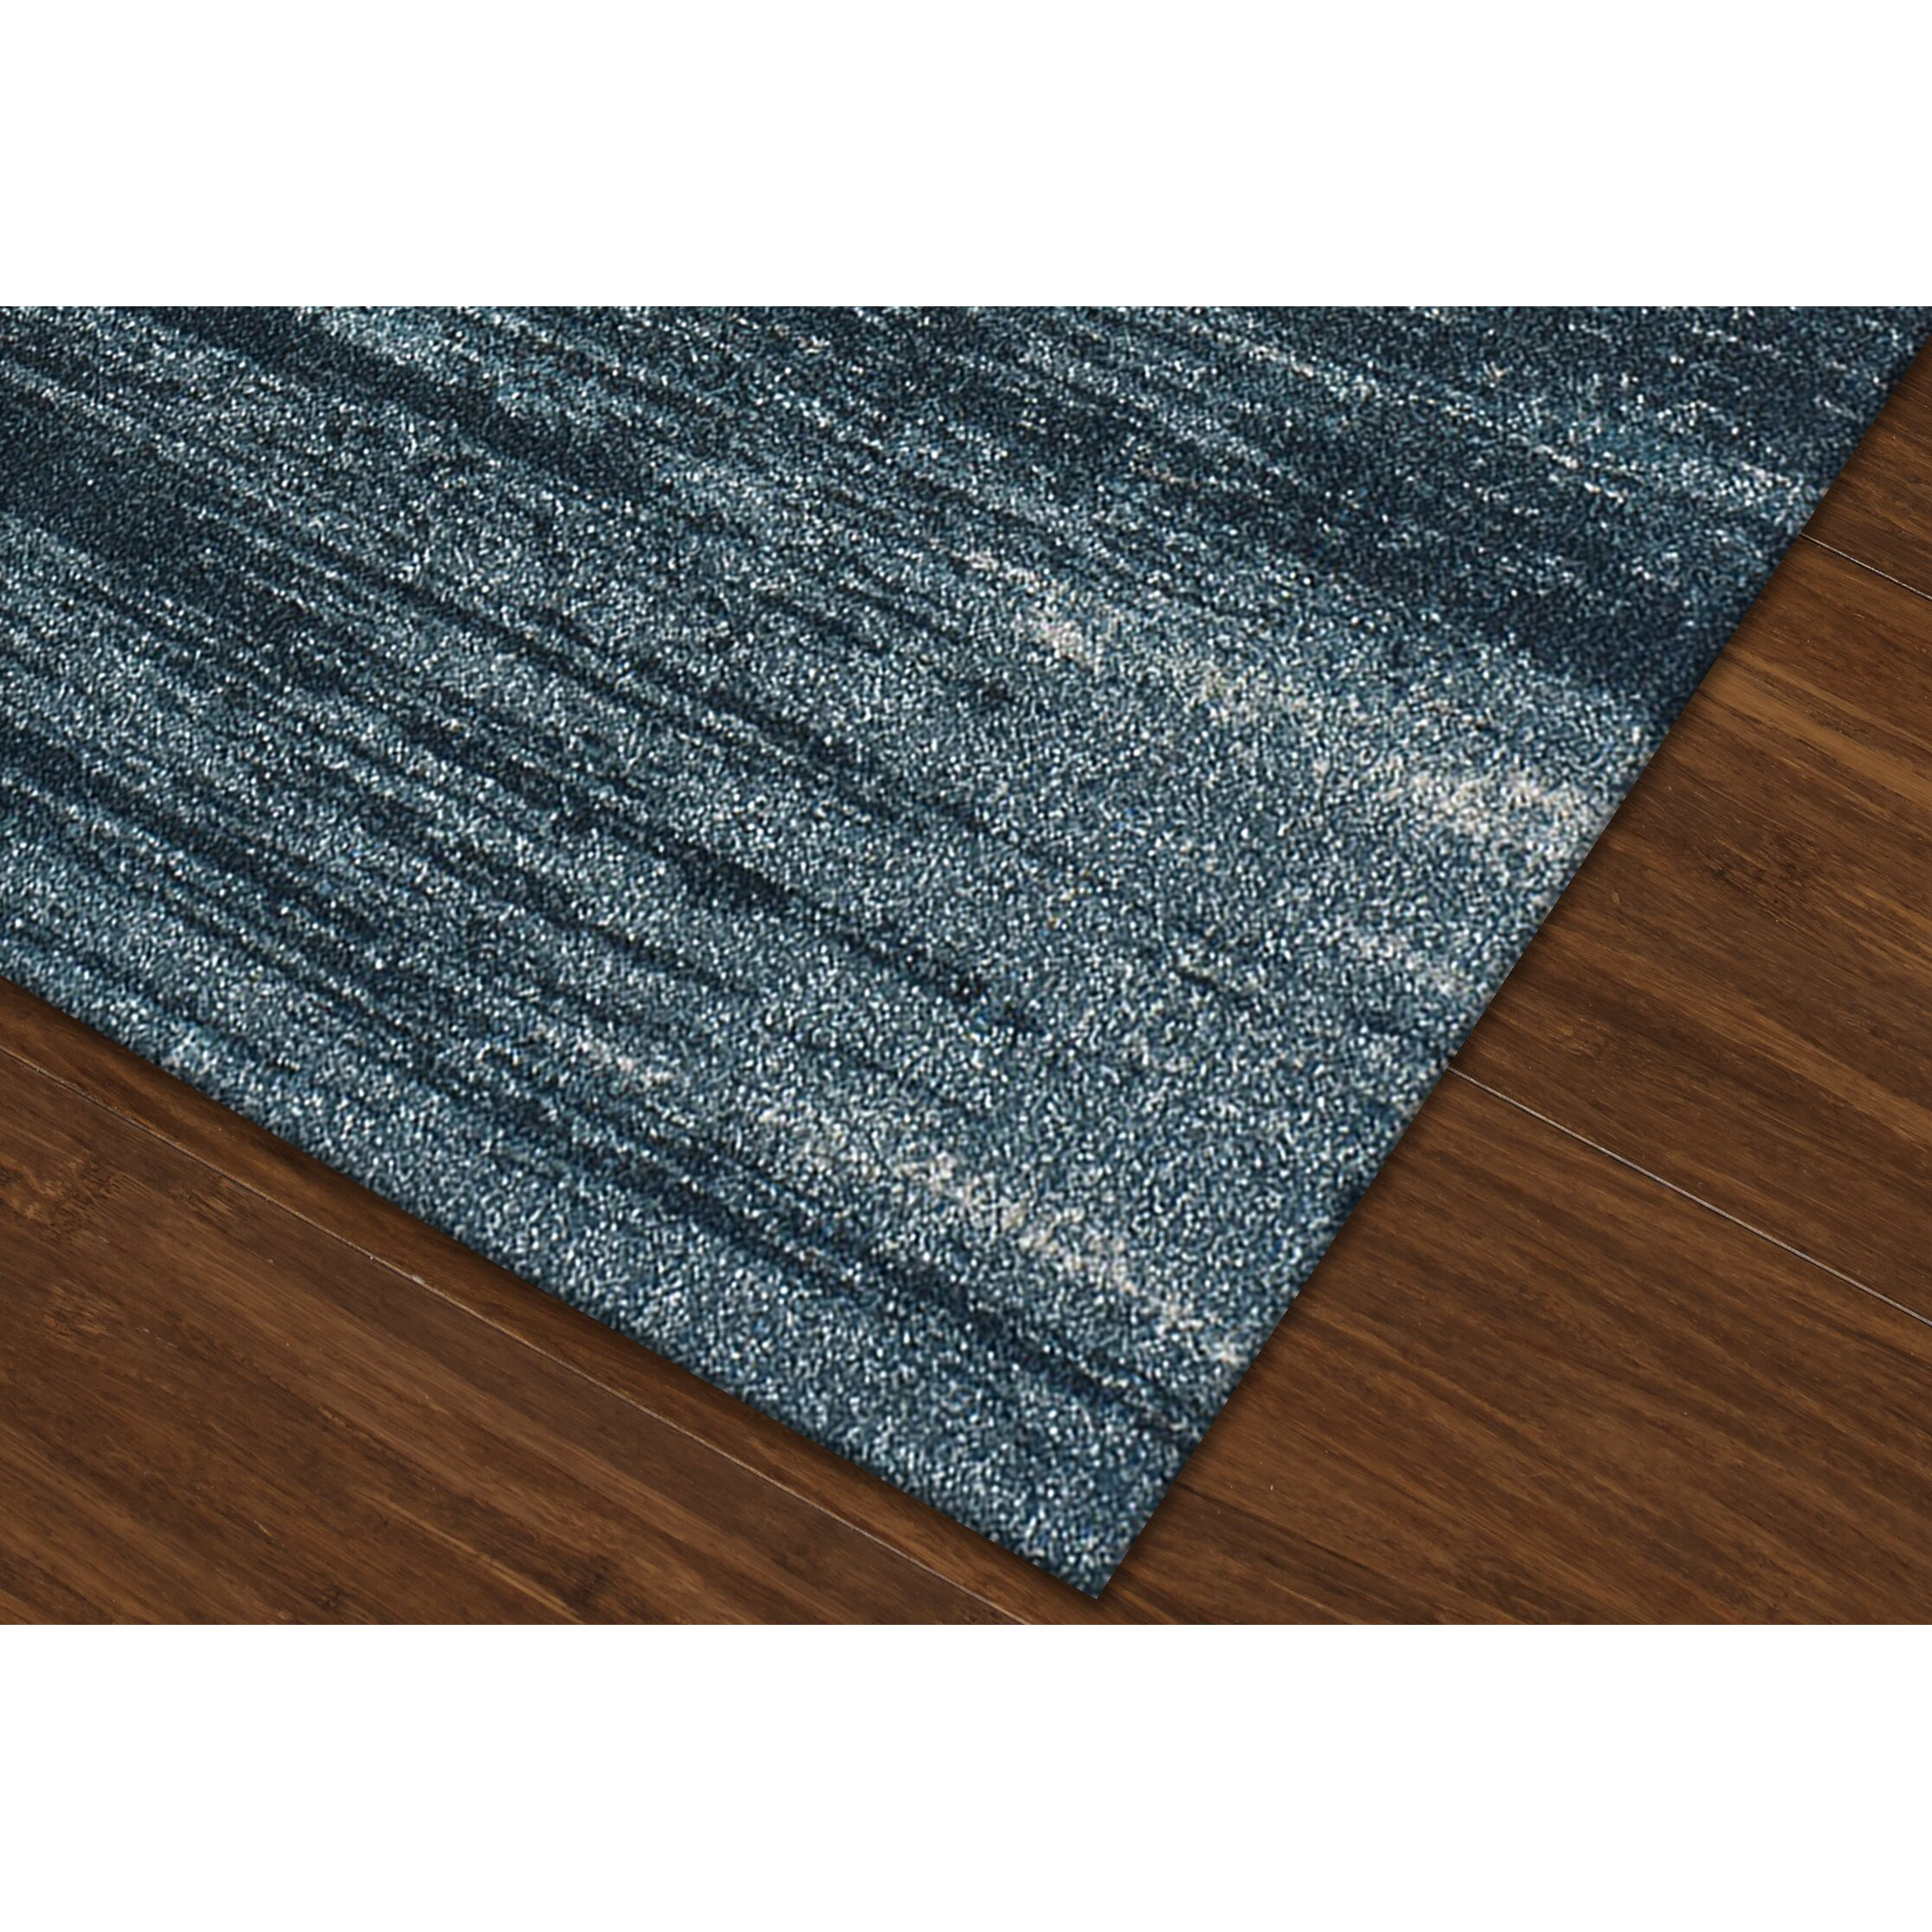 Trent Austin Designu0026reg; Elias Gray/Teal Area Rug